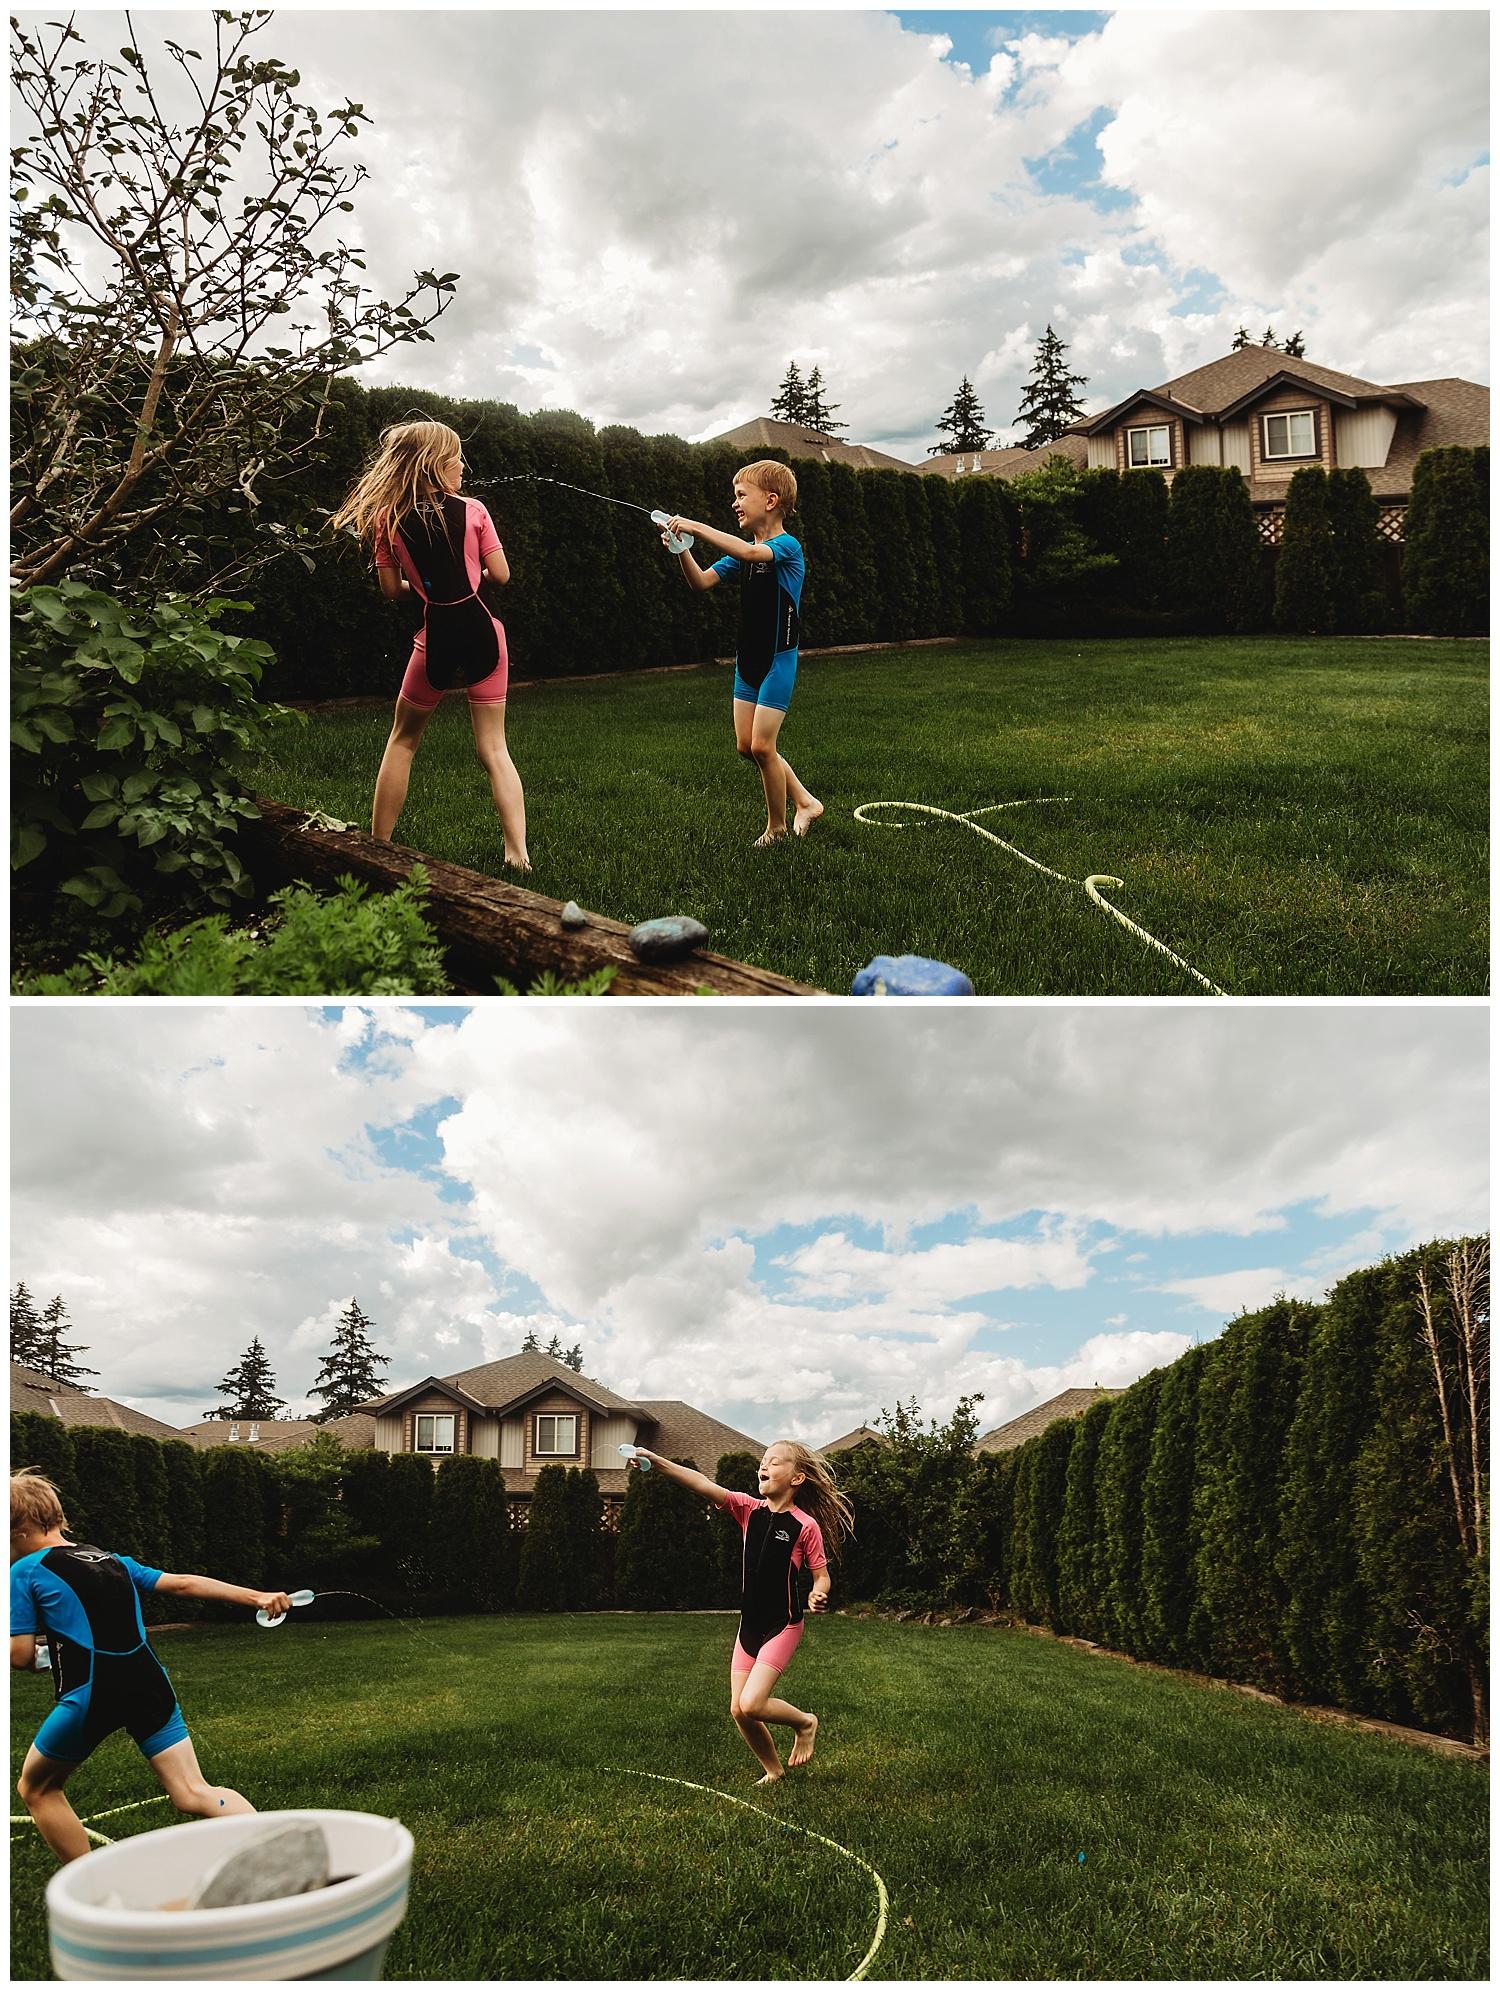 kids water balloon fight.jpg